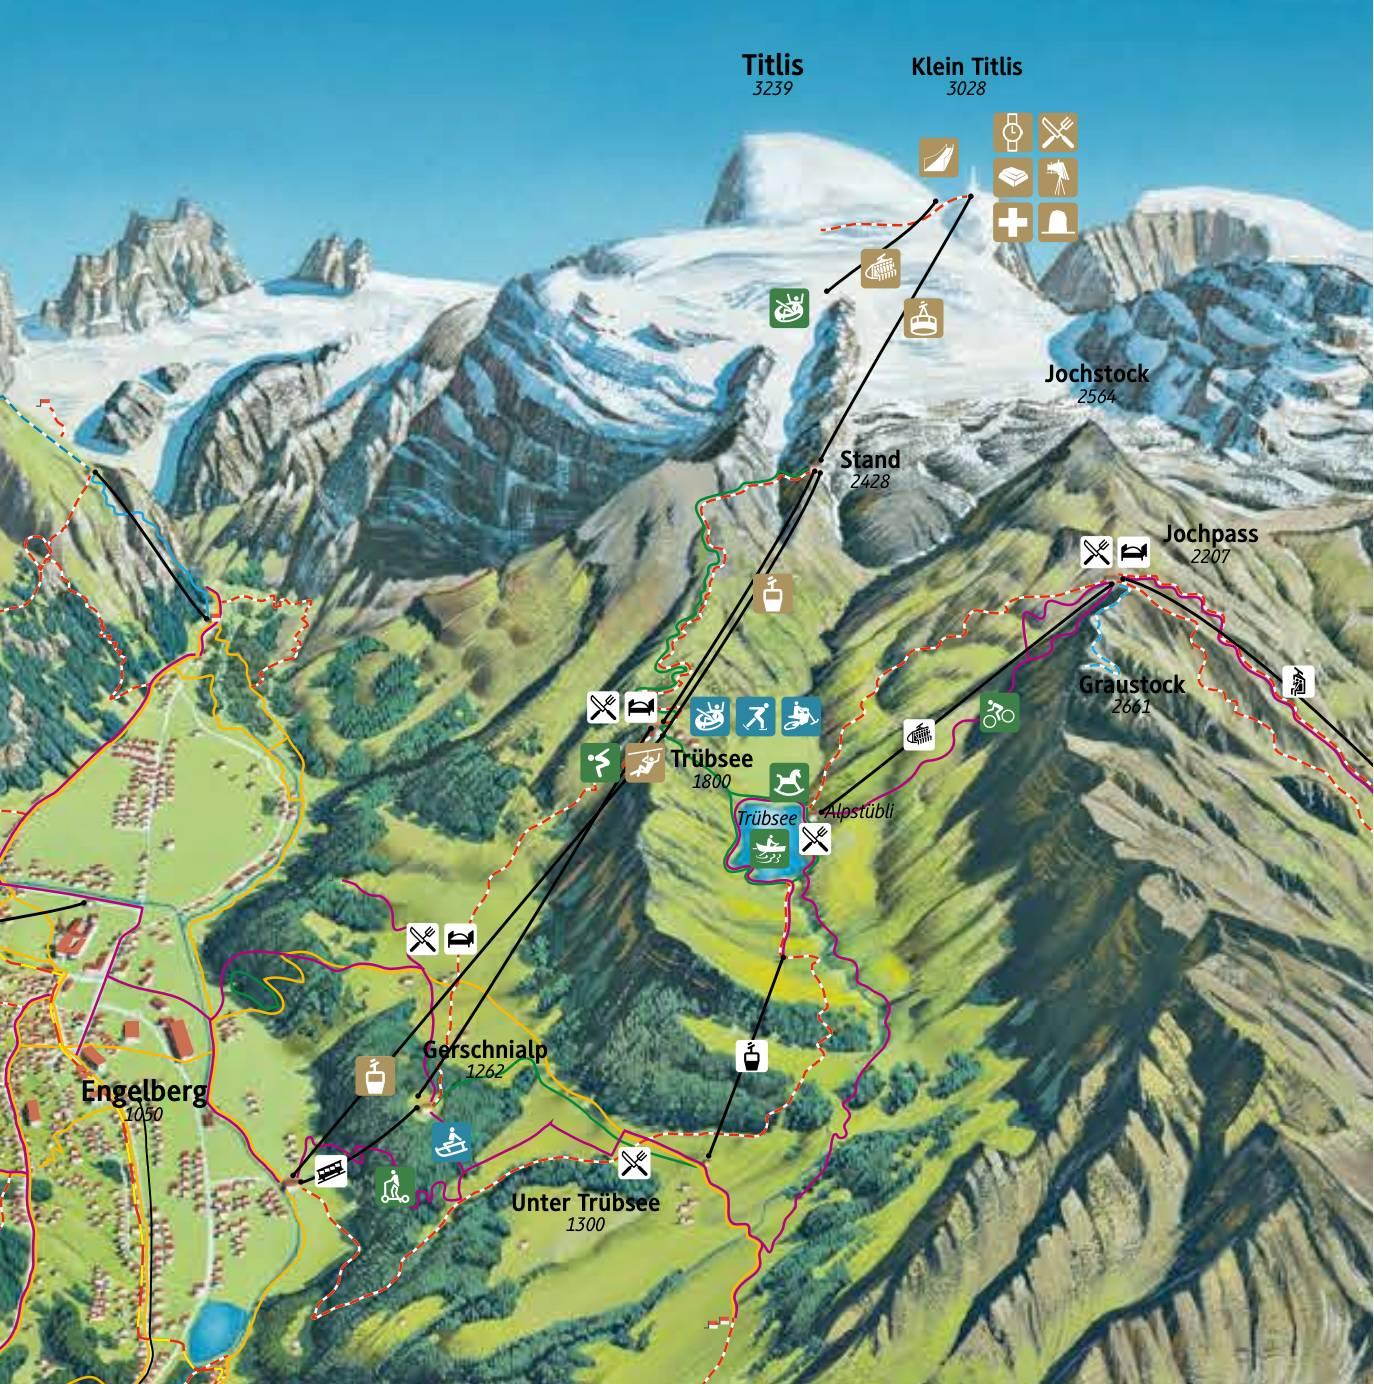 mapa montanha titlis